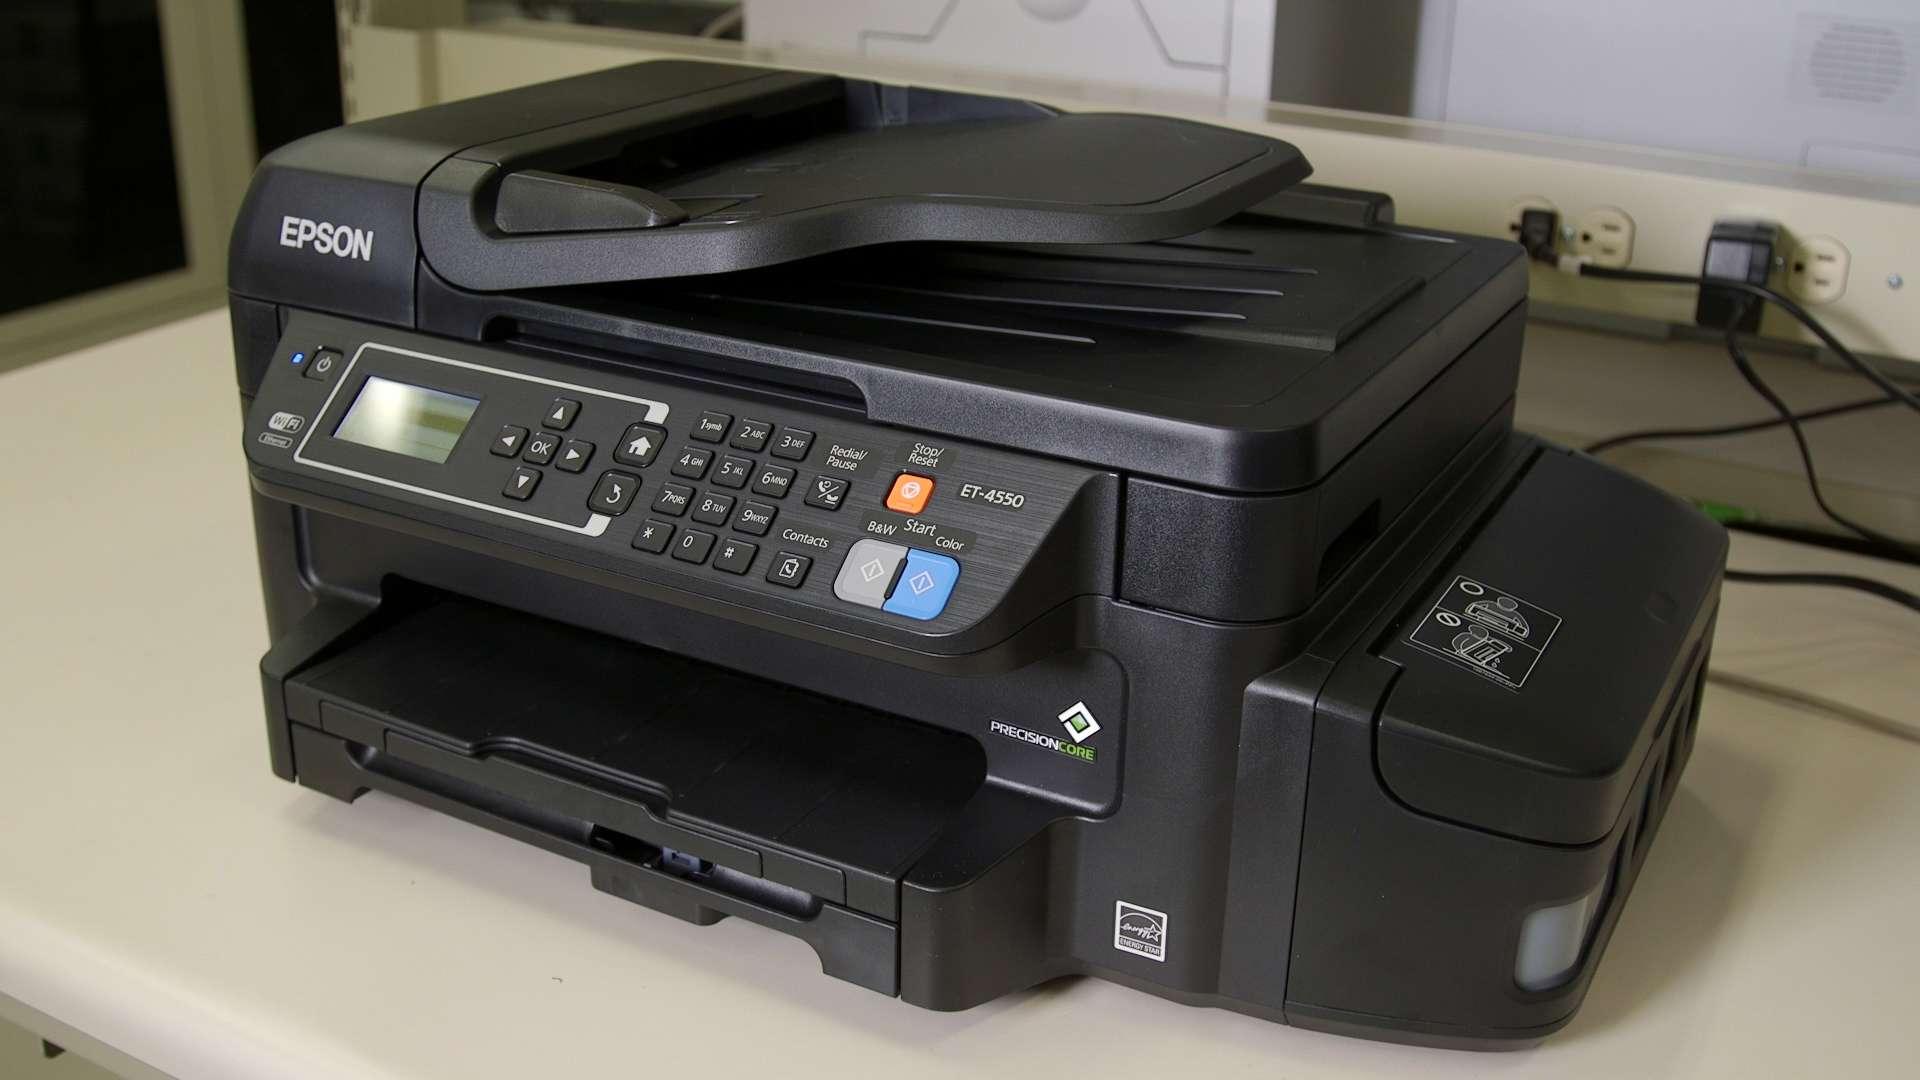 7 Steps to fix Epson Printer Error Code 0xf4